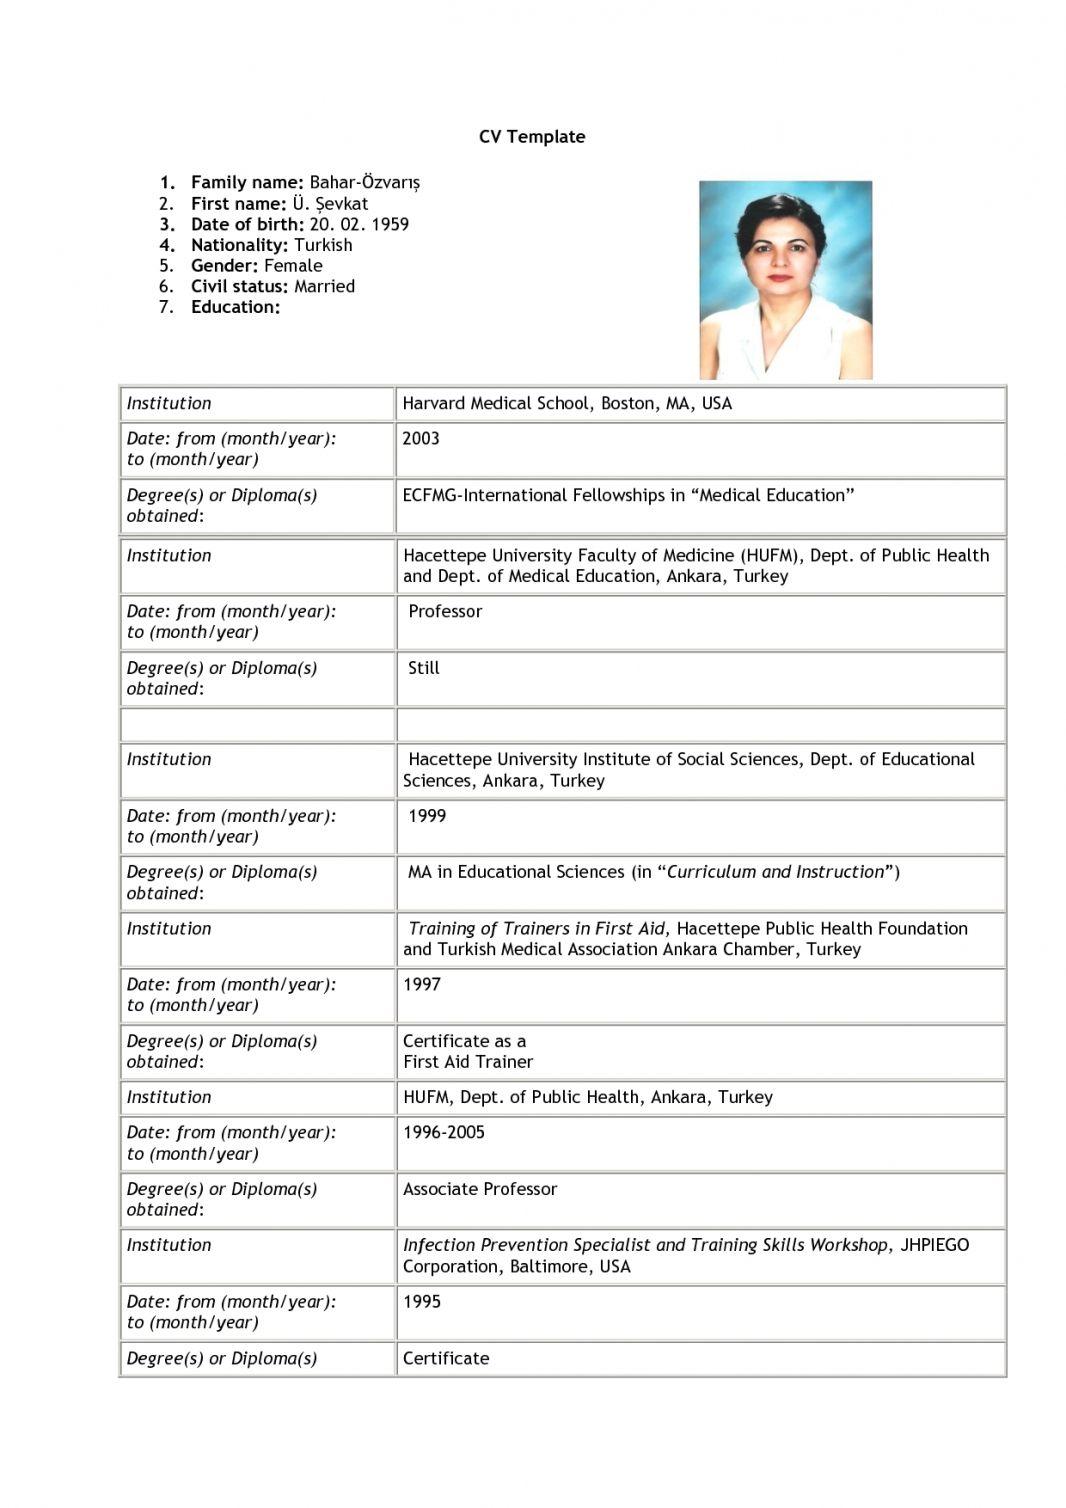 Job Interview Job resume format, Bio data for marriage